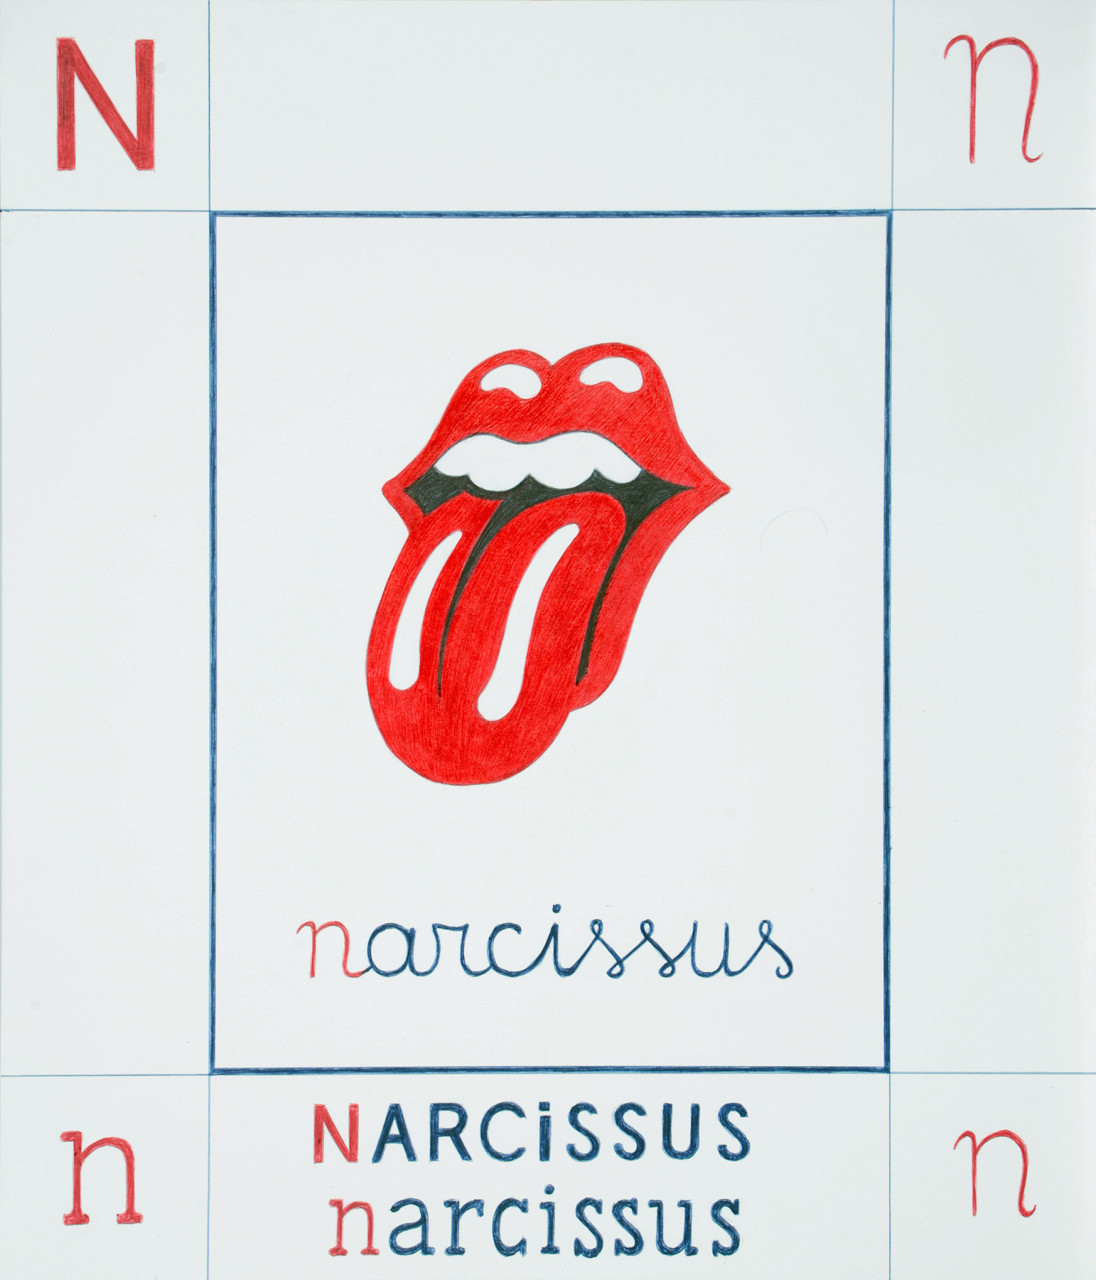 08N-narcissus_bassa